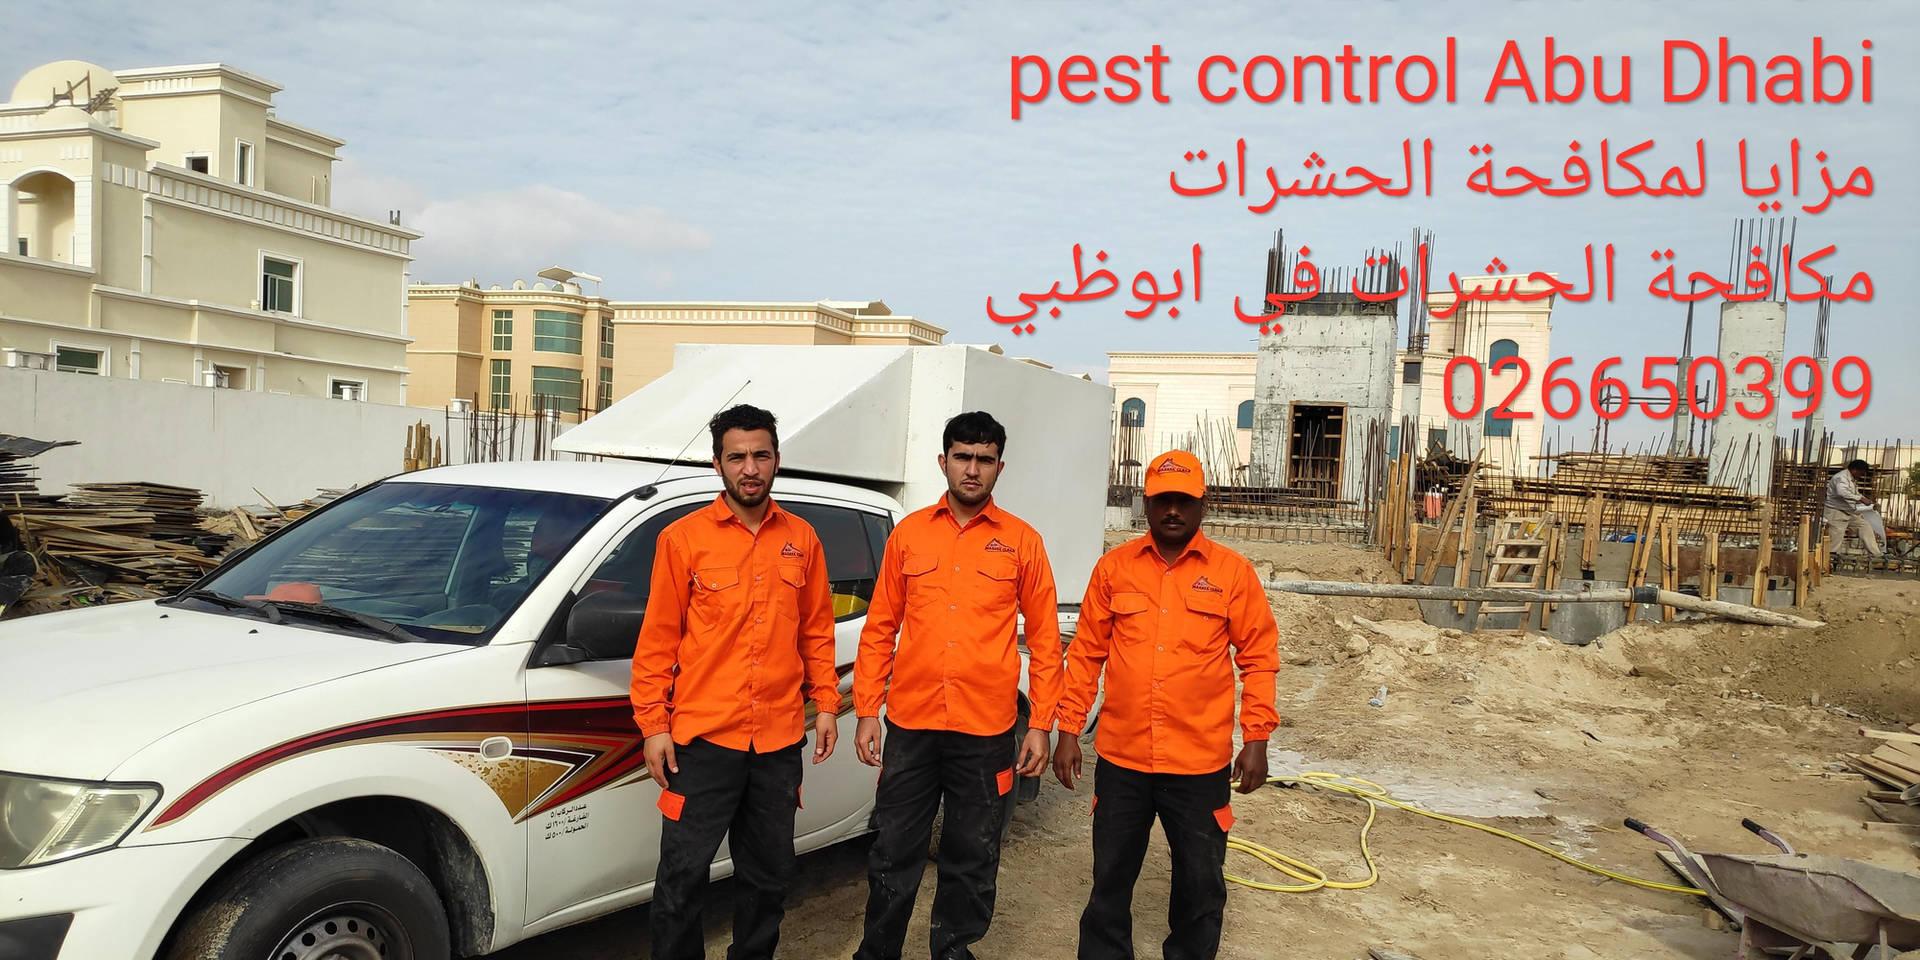 MAZAYA PEST CONTROL , pest control Abu Dhabi , pest control service